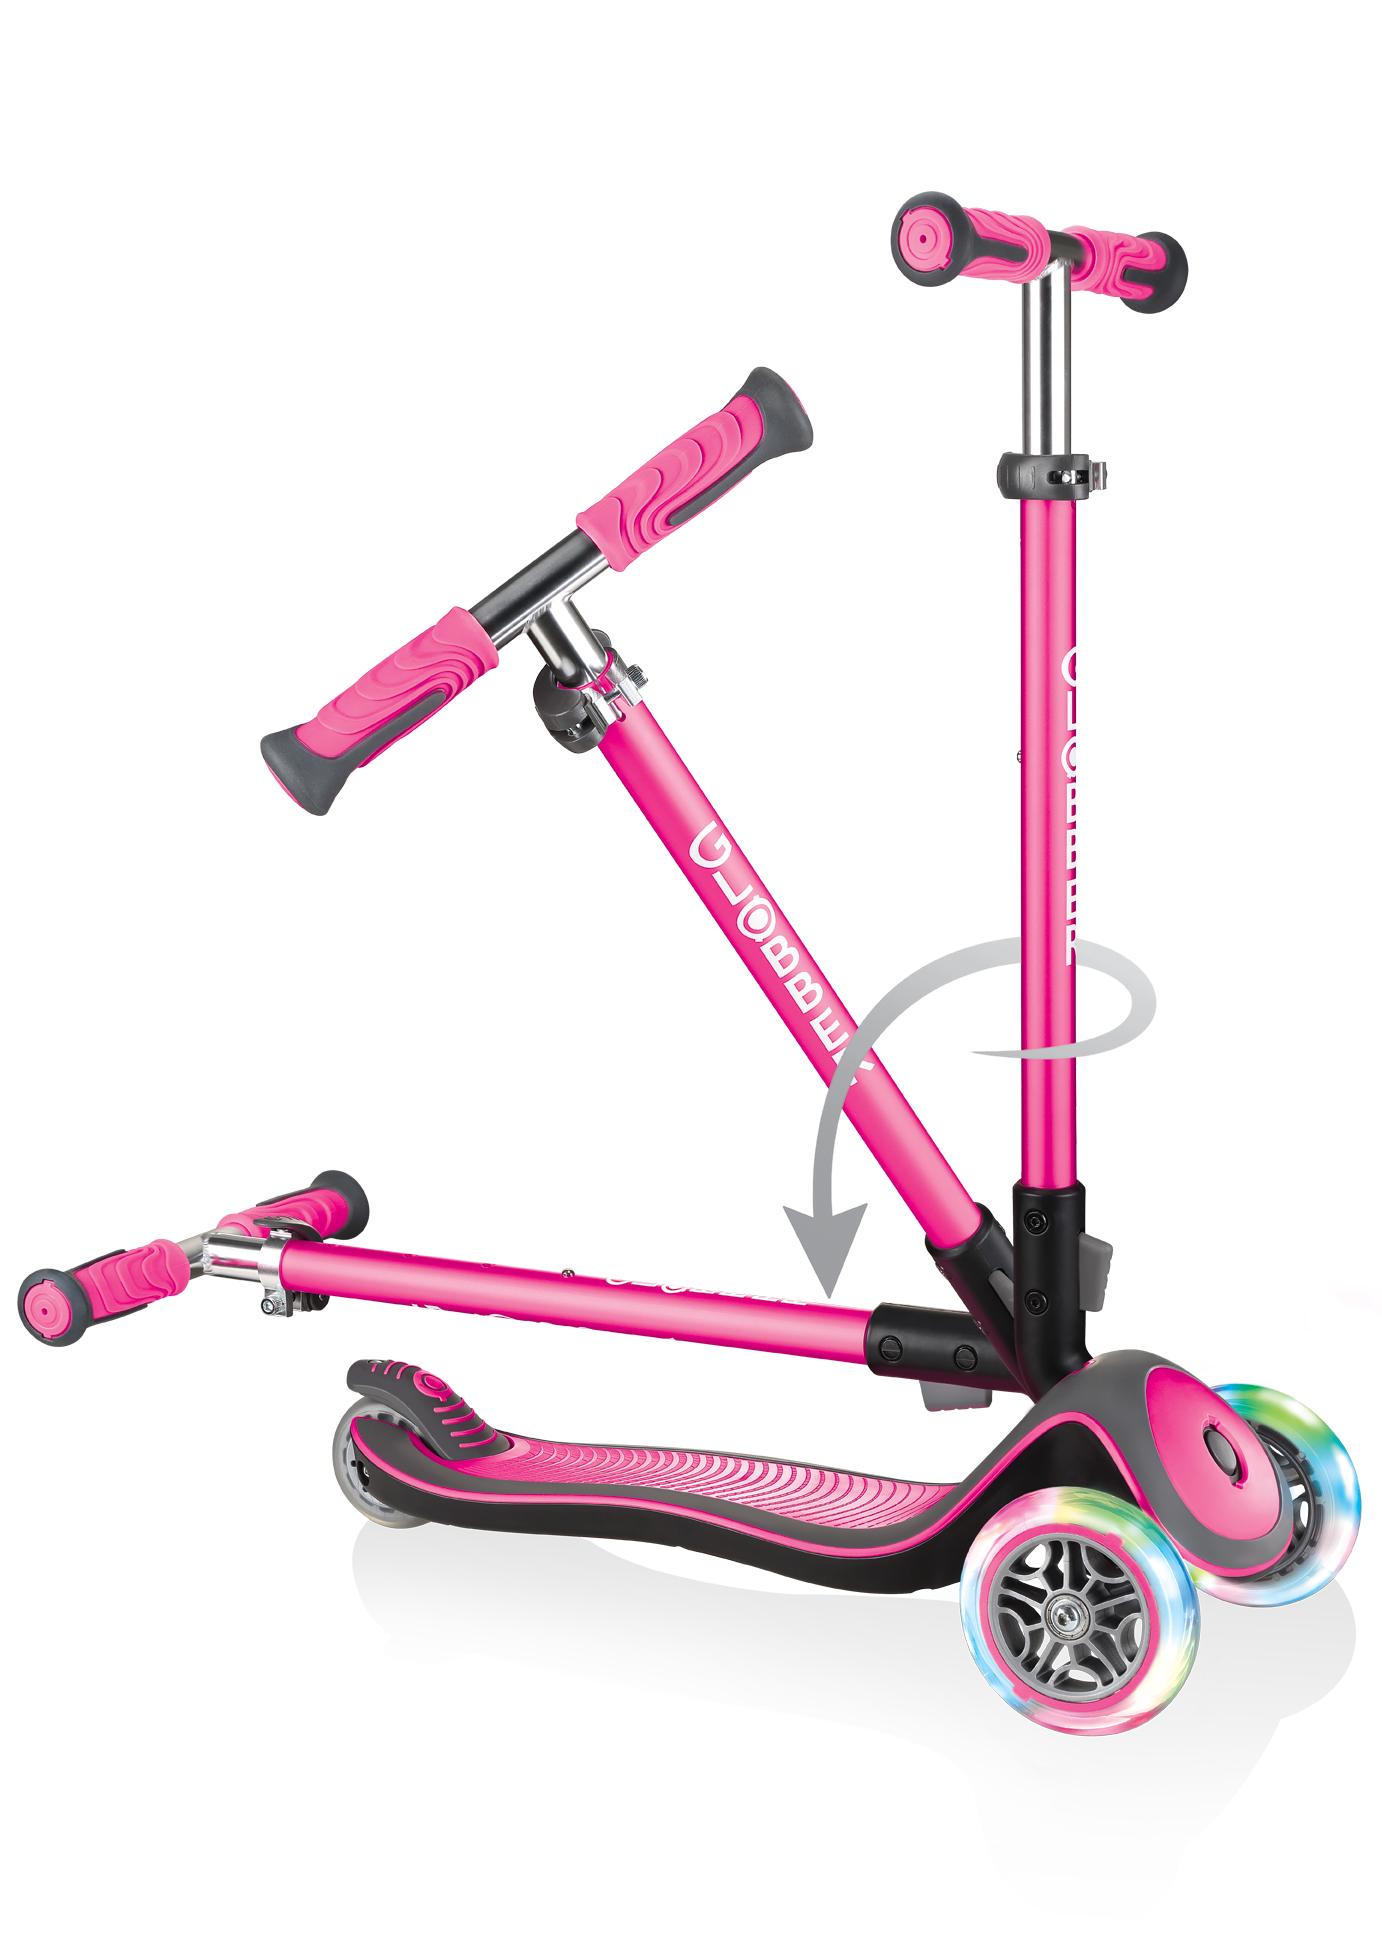 Scooter Kinderroller Globber Elite Deluxe Scooter pink +Leuchtrollen Bild 3